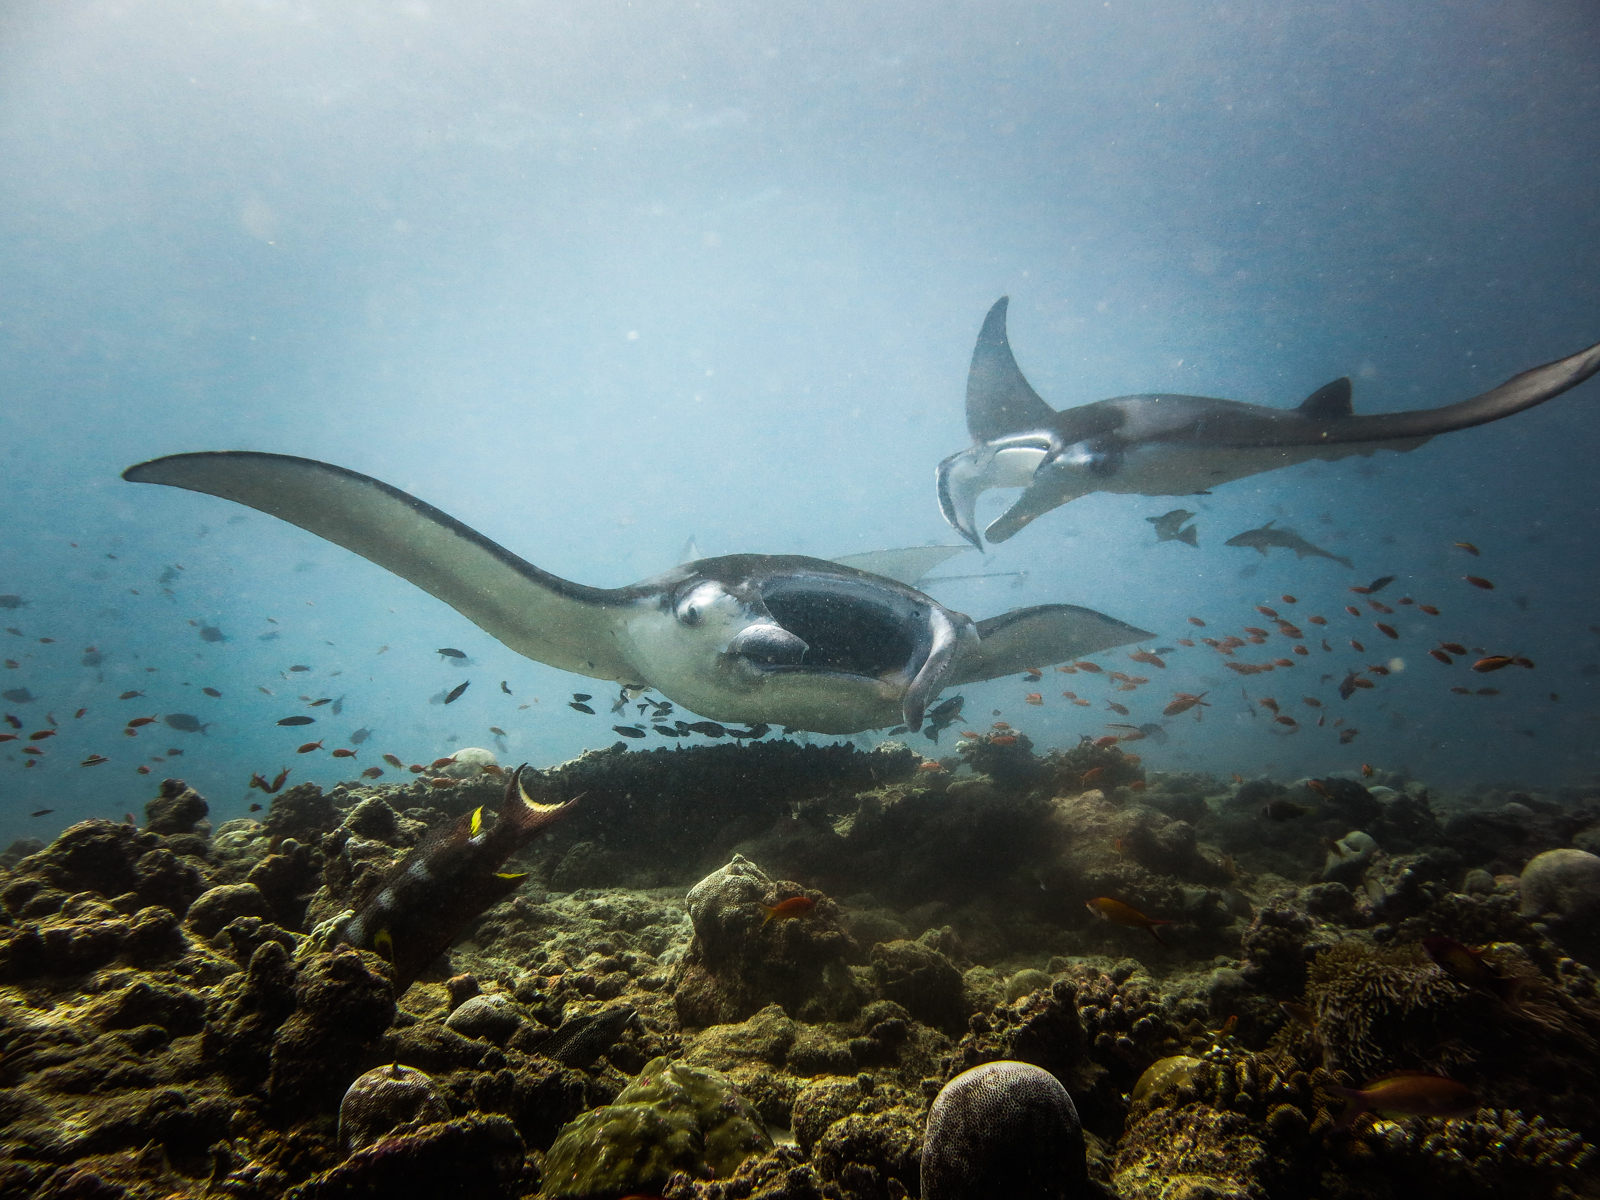 malediven 2014 (6 of 14)